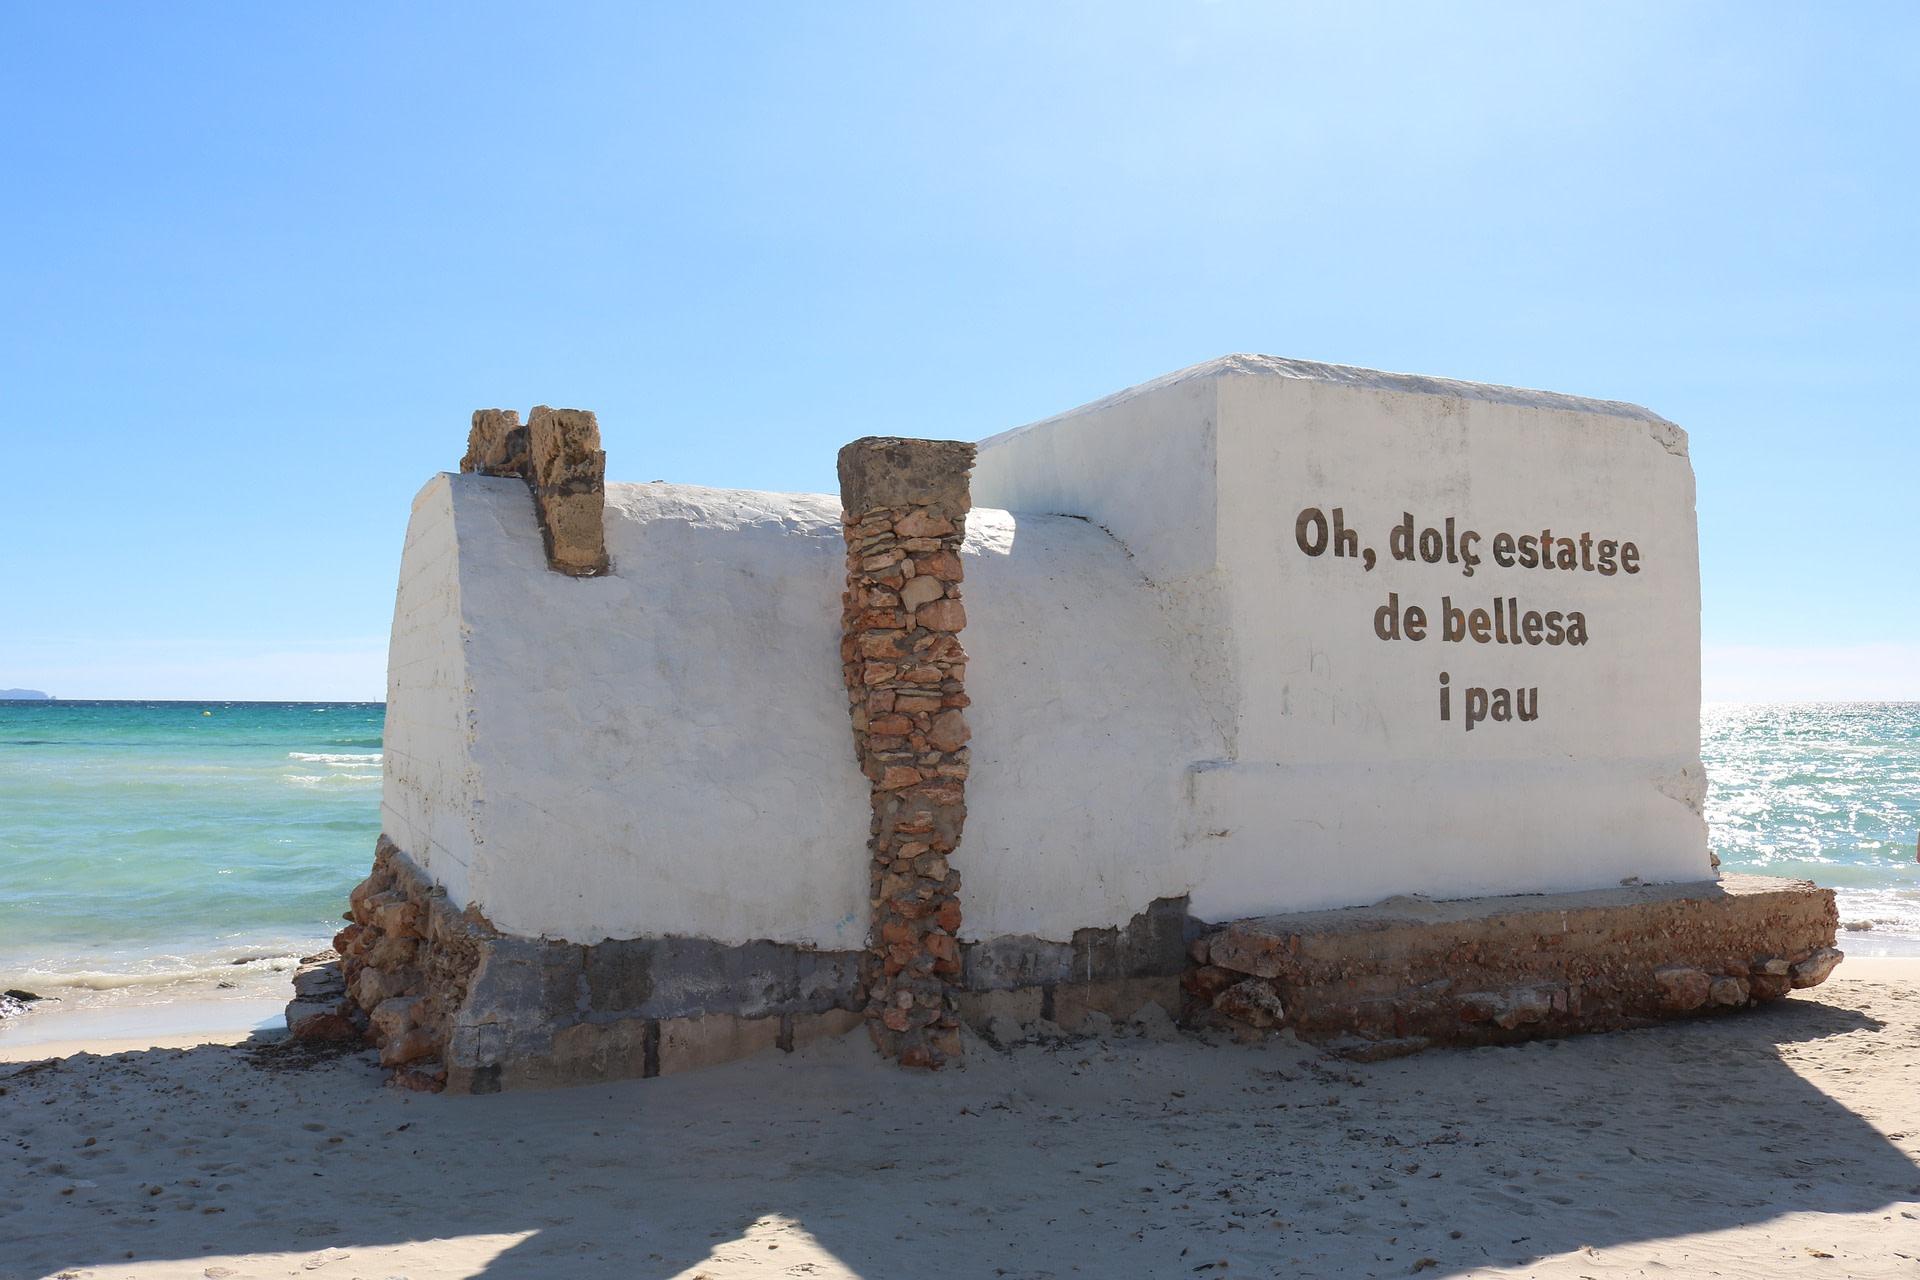 Bunker am Strand von Es Trenc in La colònia de Sant Jordi